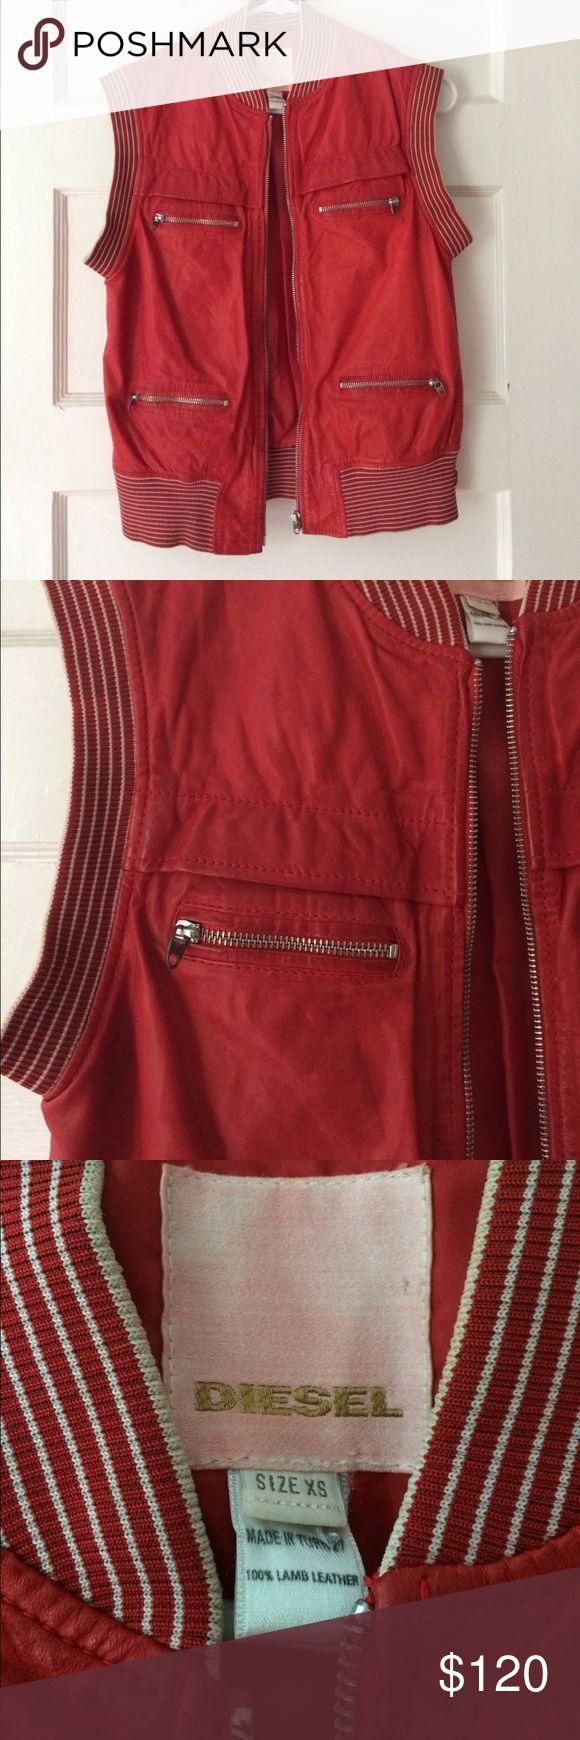 Vintage Diesel red motorcycle Leather vest 100% lamb leather Diesel Jackets & Coats Vests